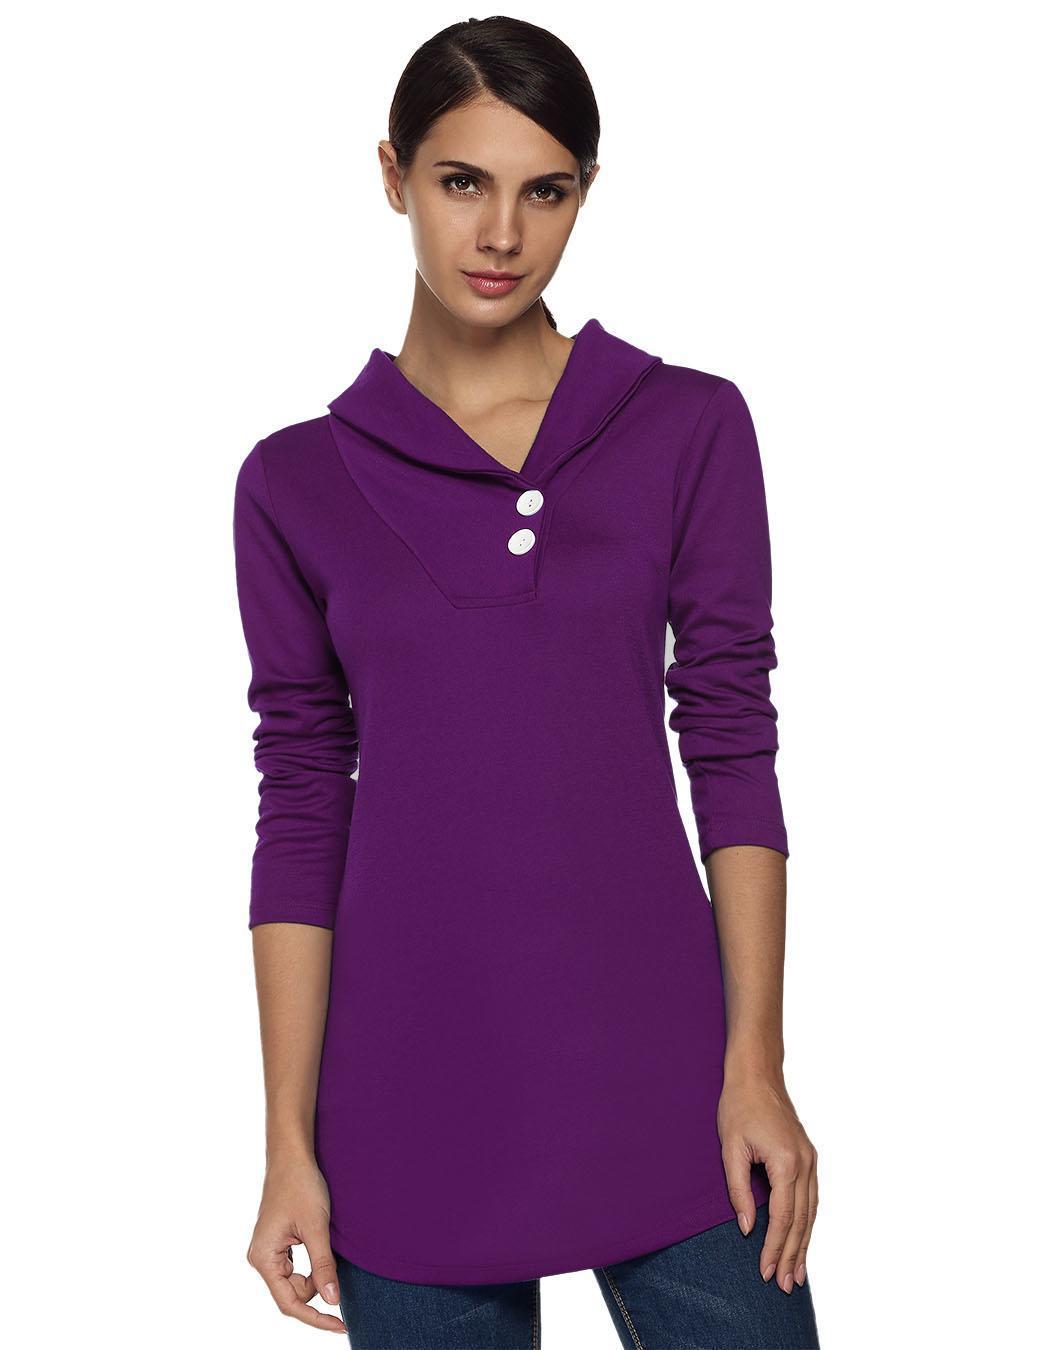 Women Shawl Collar Long Sleeve Solid Tunic Outwear Tops Blouse Coat 1